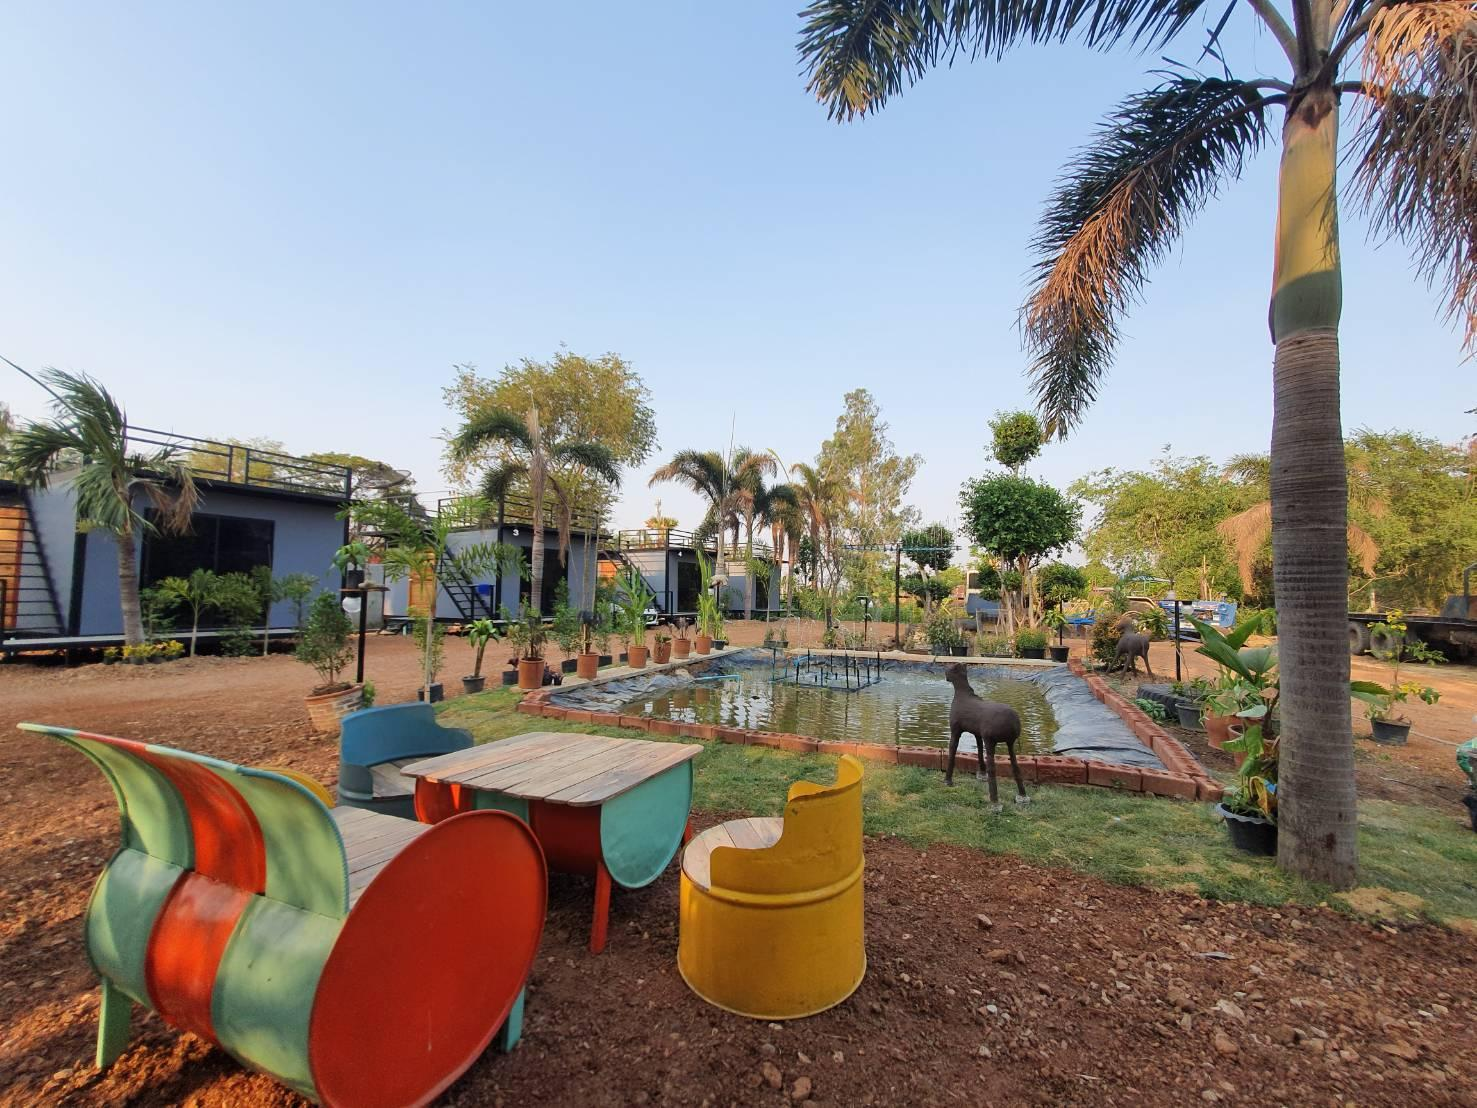 Sky View Resort Chainat สตูดิโอ บังกะโล 1 ห้องน้ำส่วนตัว ขนาด 18 ตร.ม. – เมืองชัยนาท